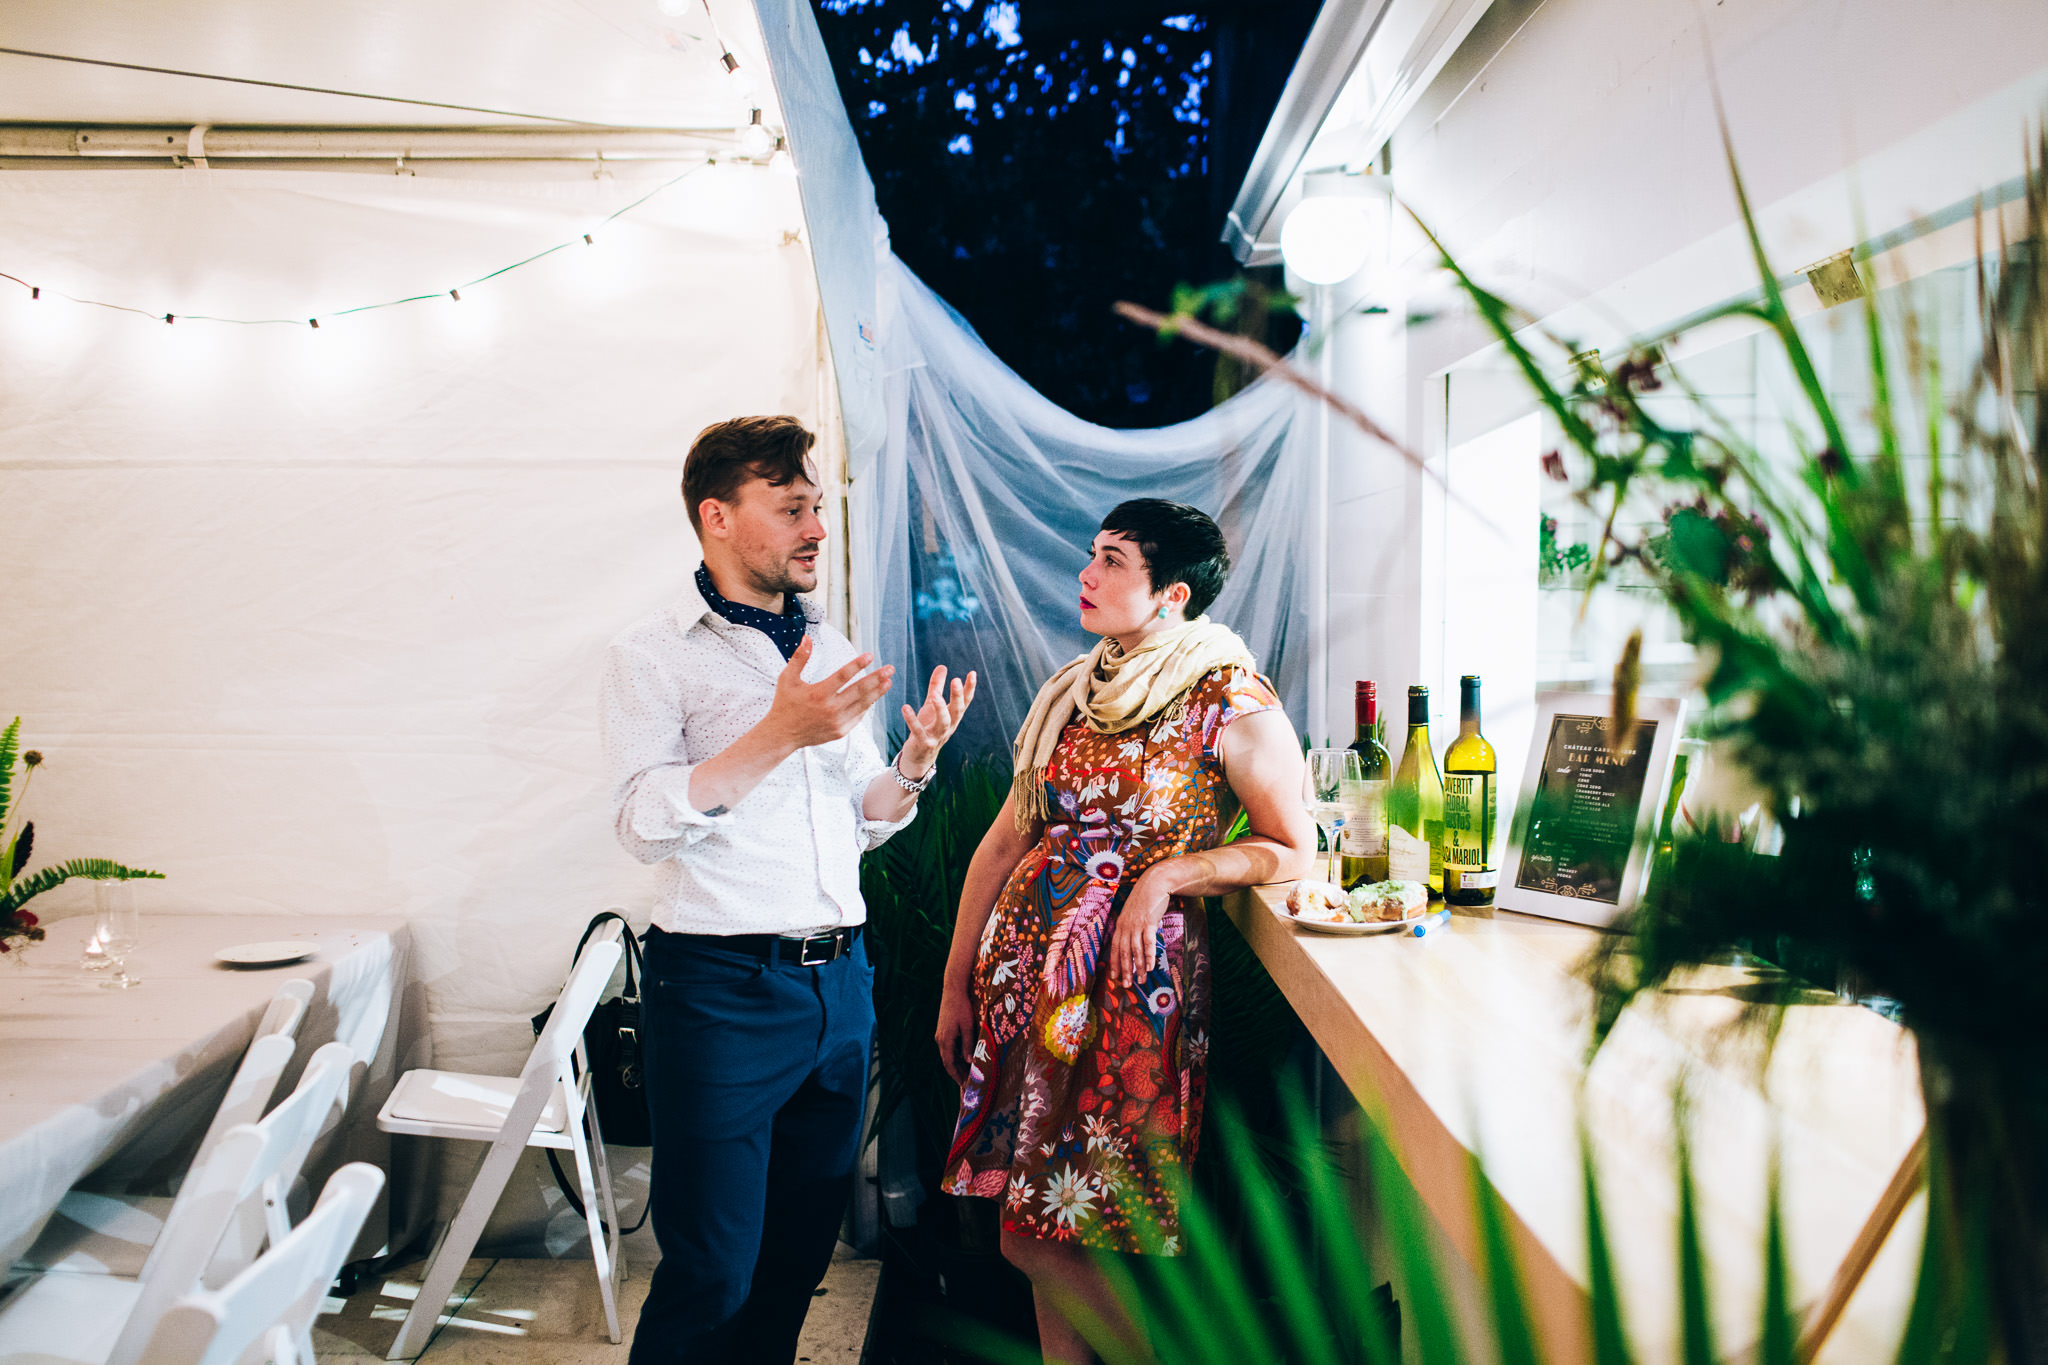 077_Canada-documentary-wedding-photograp